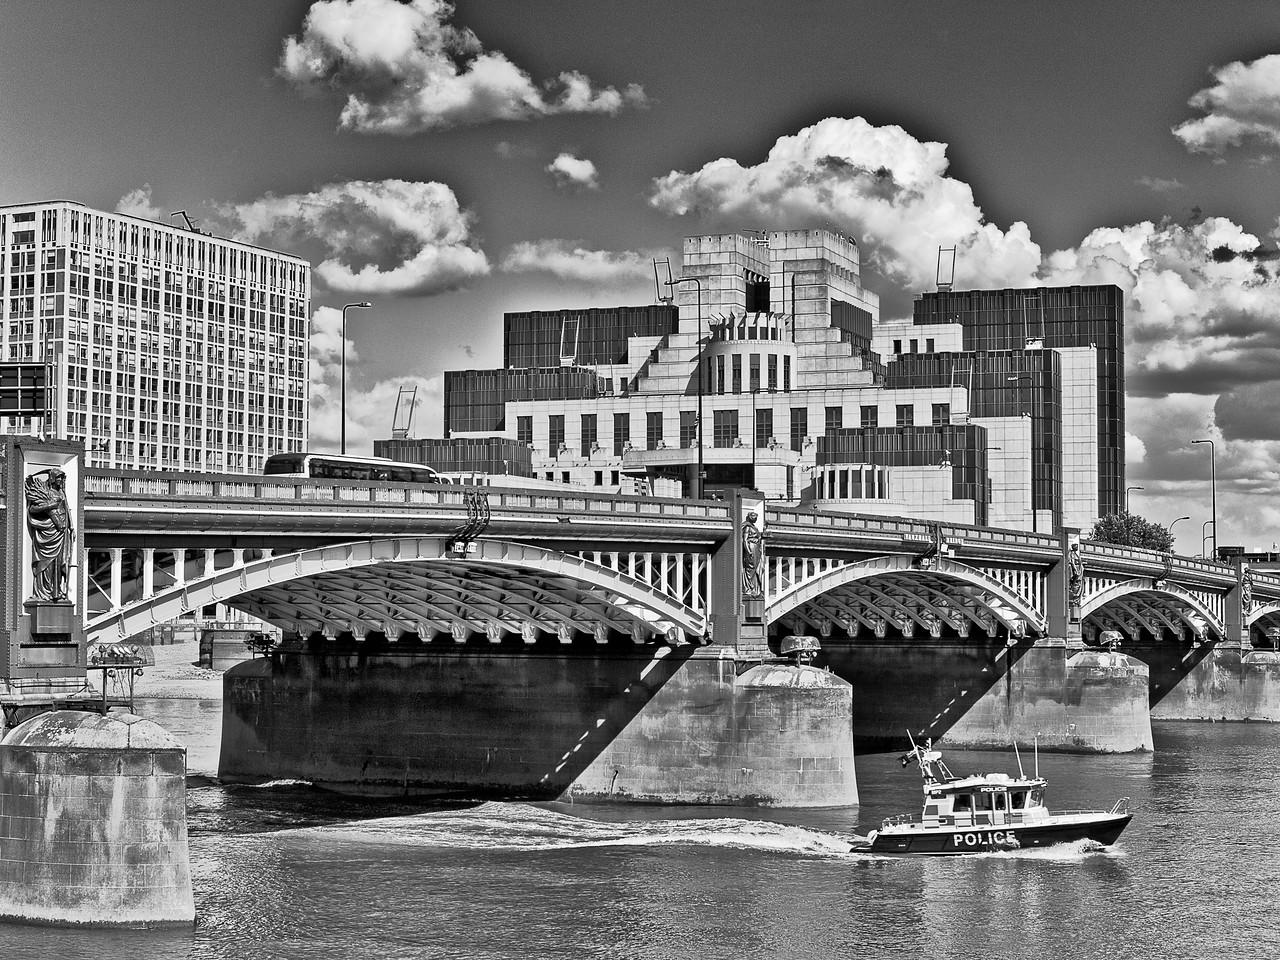 Vauxhall Bridge in London, England with the MI5 Building